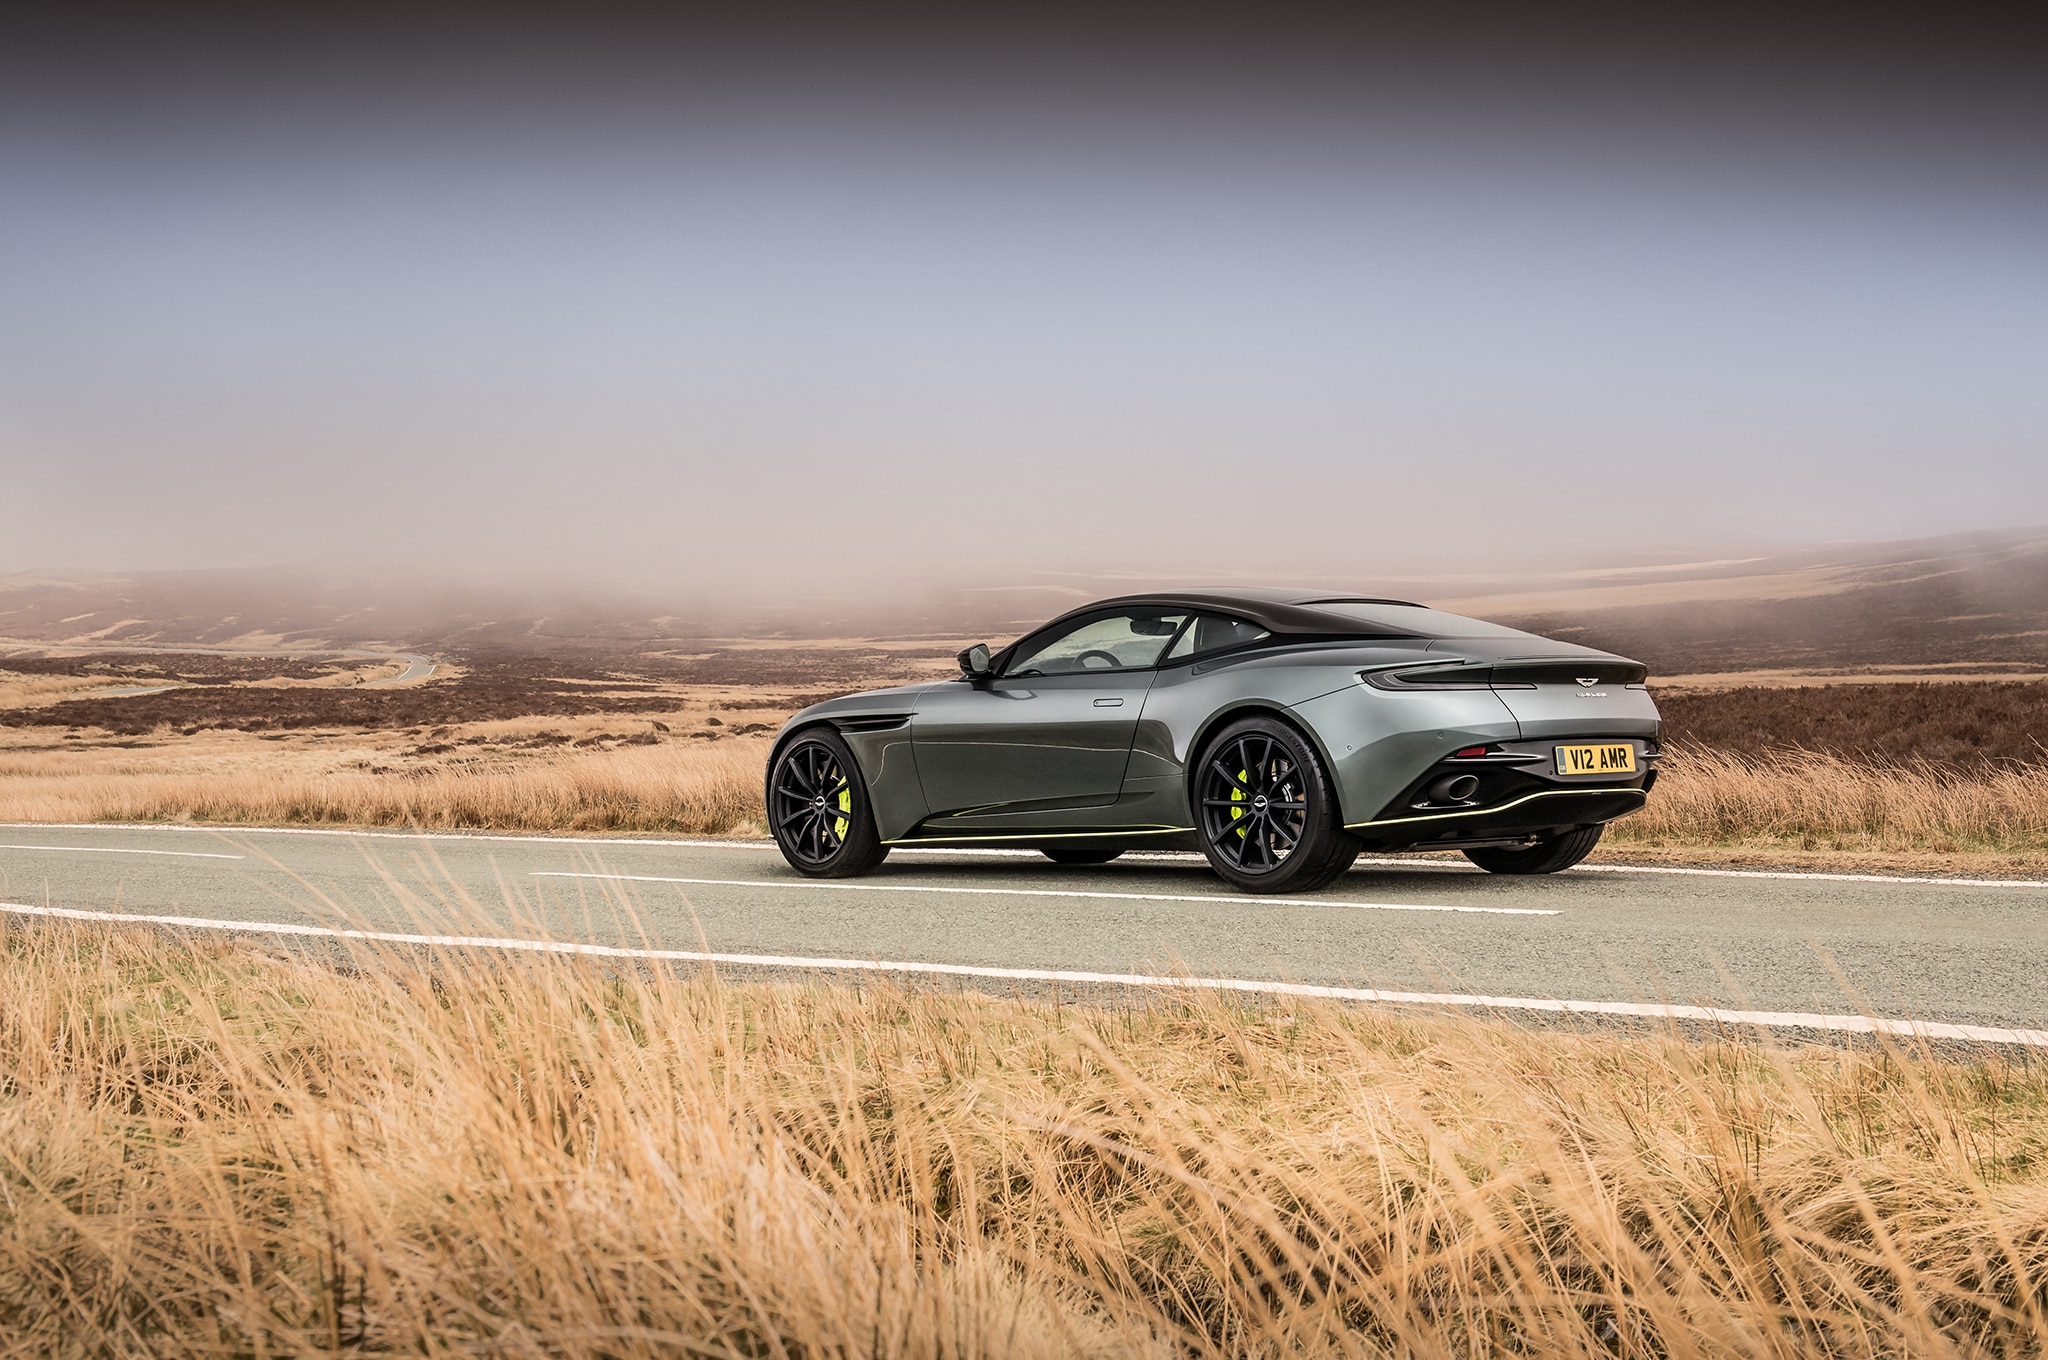 2019 Aston Martin DB11 AMR (7)